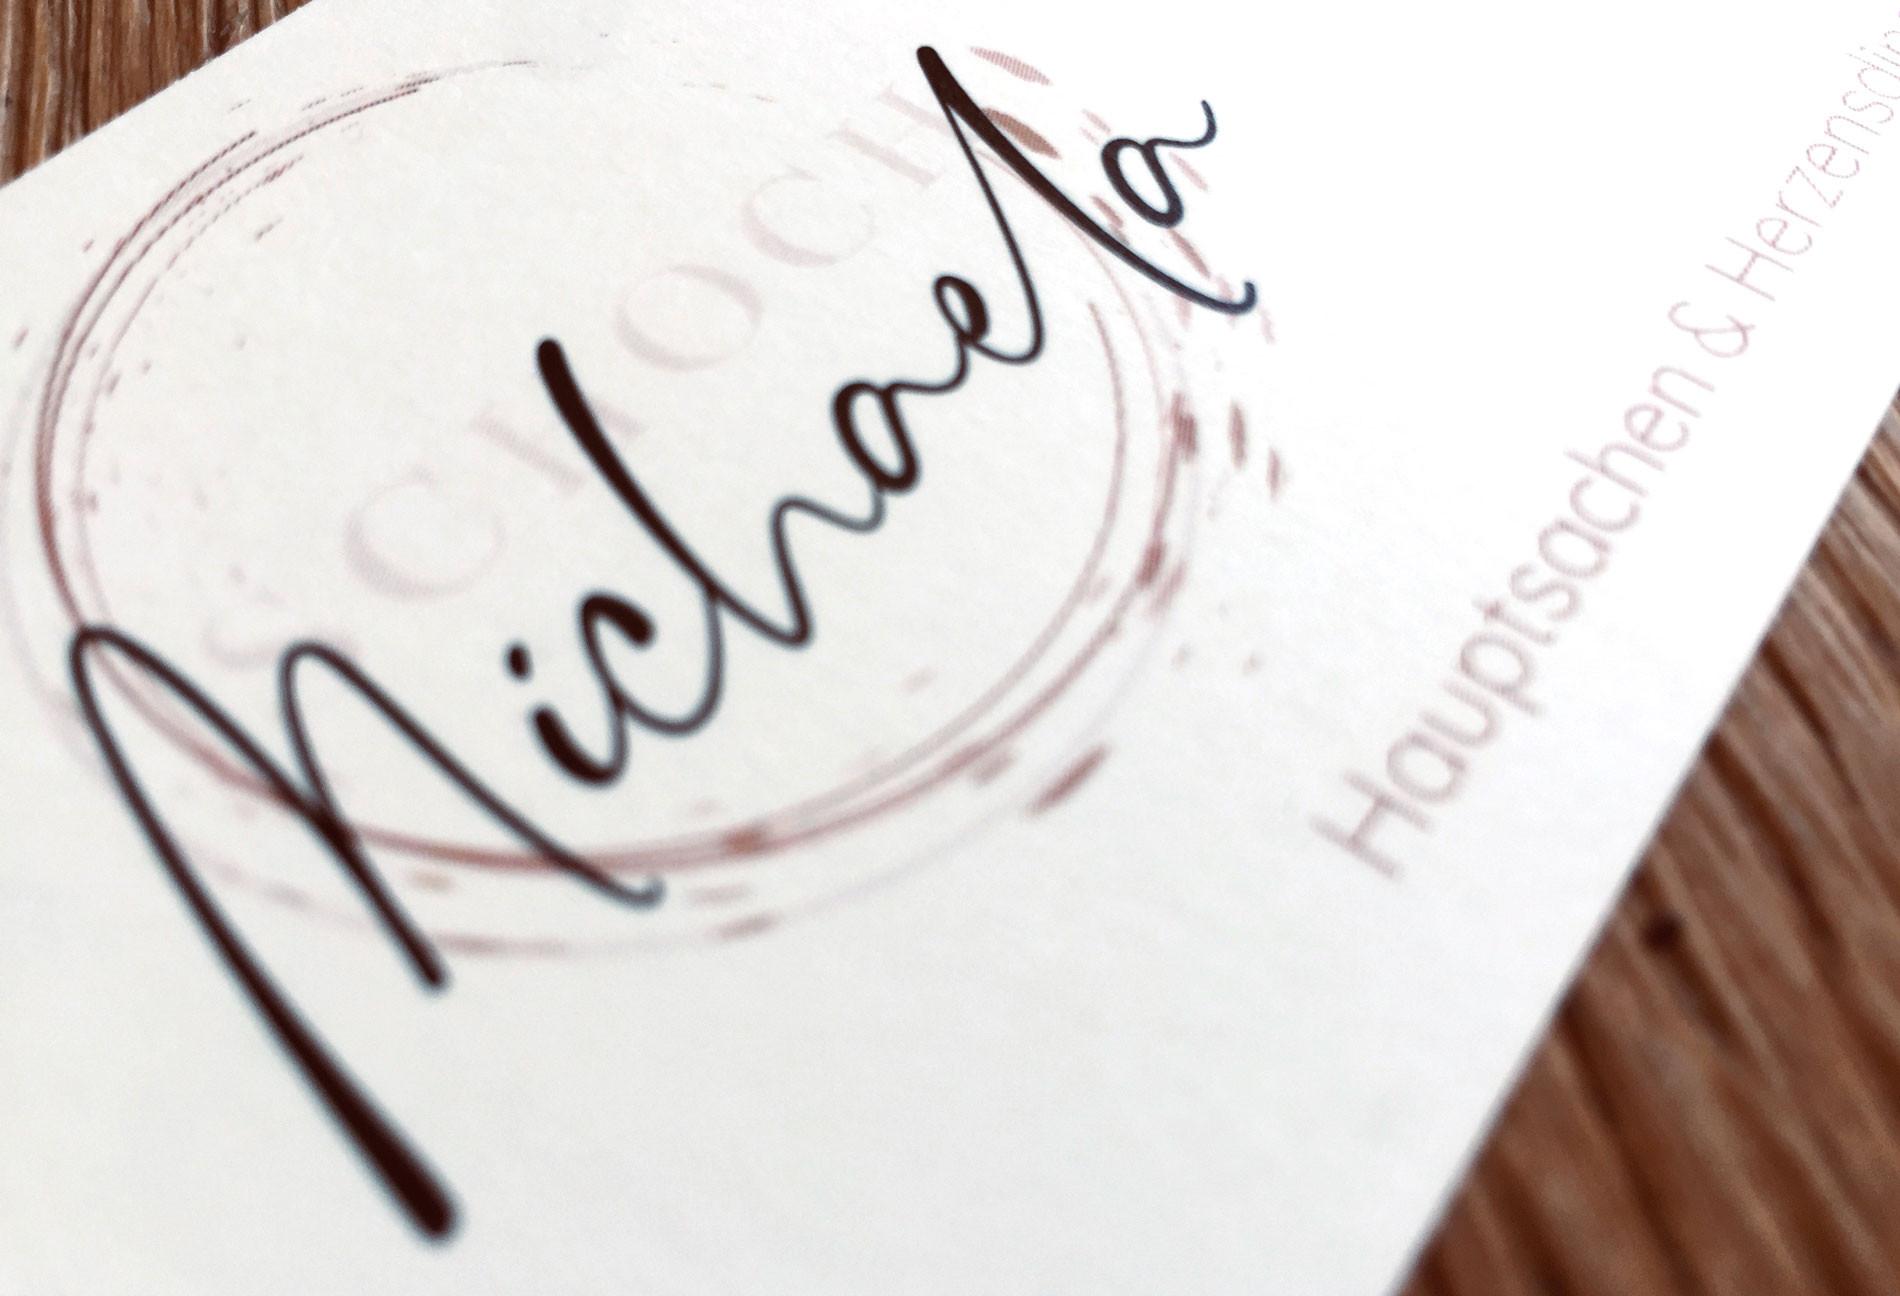 Michi_Schoch_Logo1.jpg